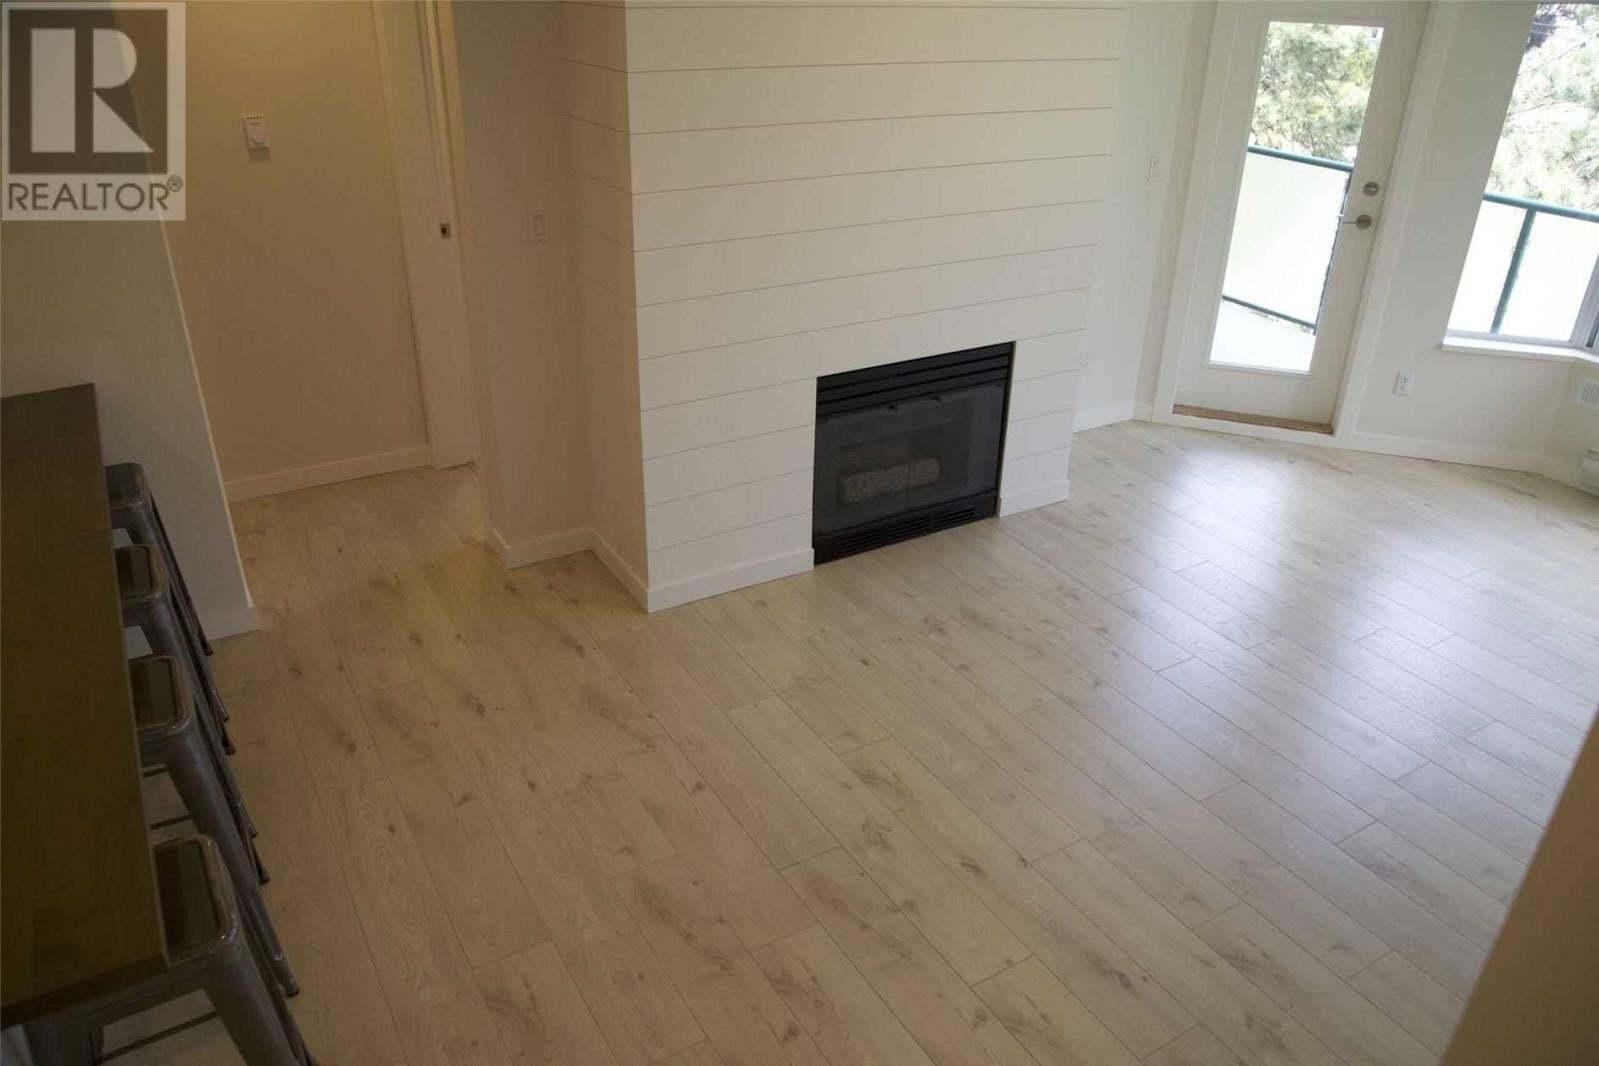 Condo for sale at 2964 Trethewey Te Unit 410 Abbotsford British Columbia - MLS: X4809964